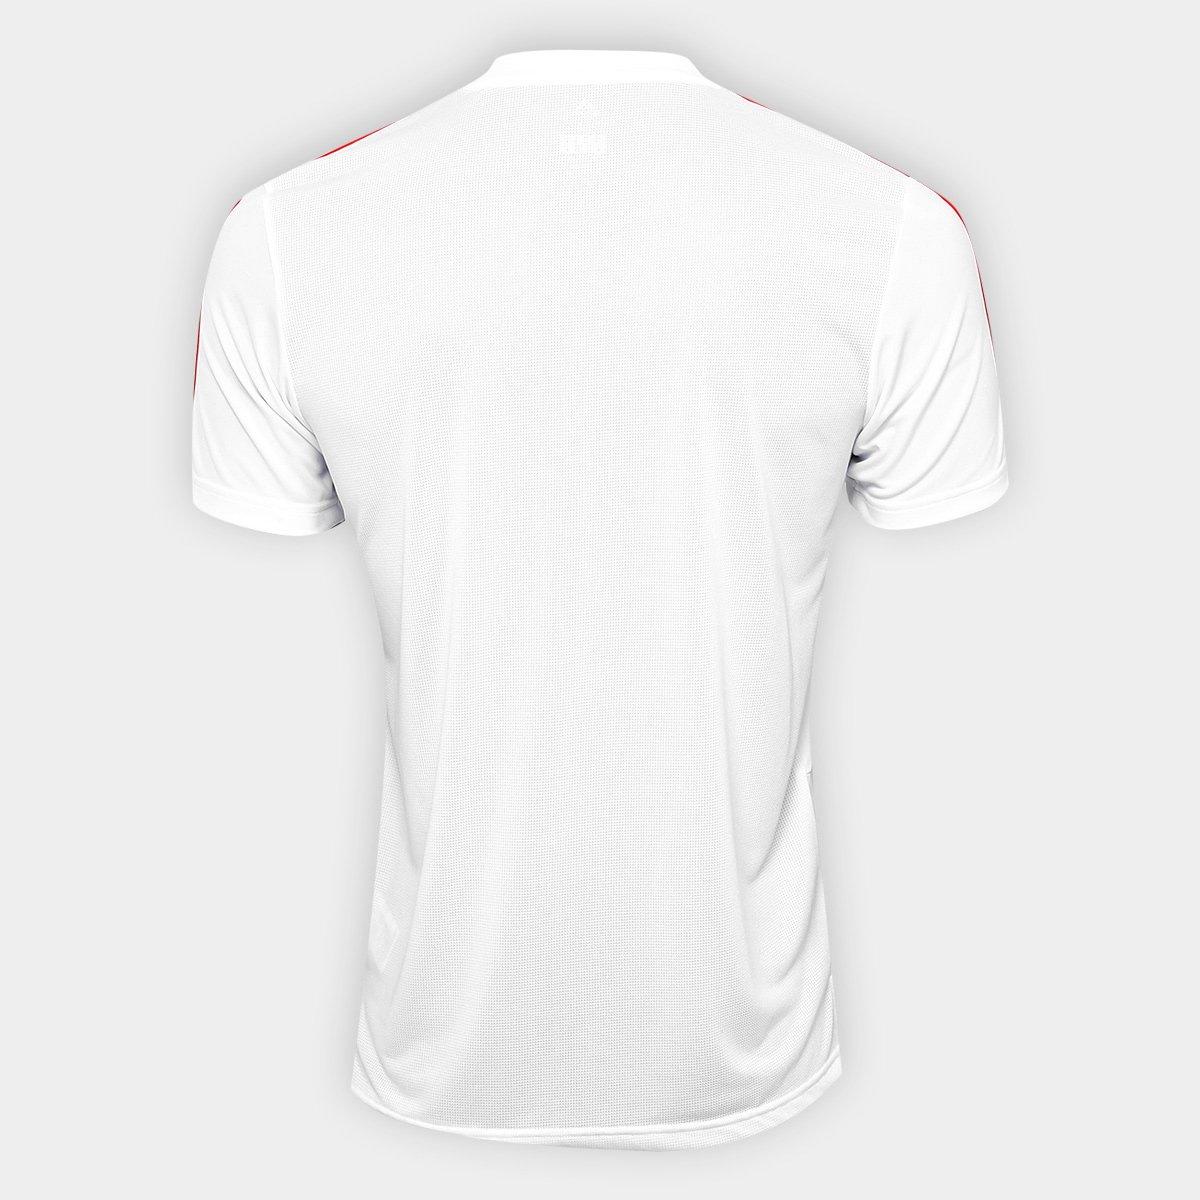 4e25472141 Camisa Flamengo Treino Adidas Masculina  Camisa Flamengo Treino Adidas  Masculina ...